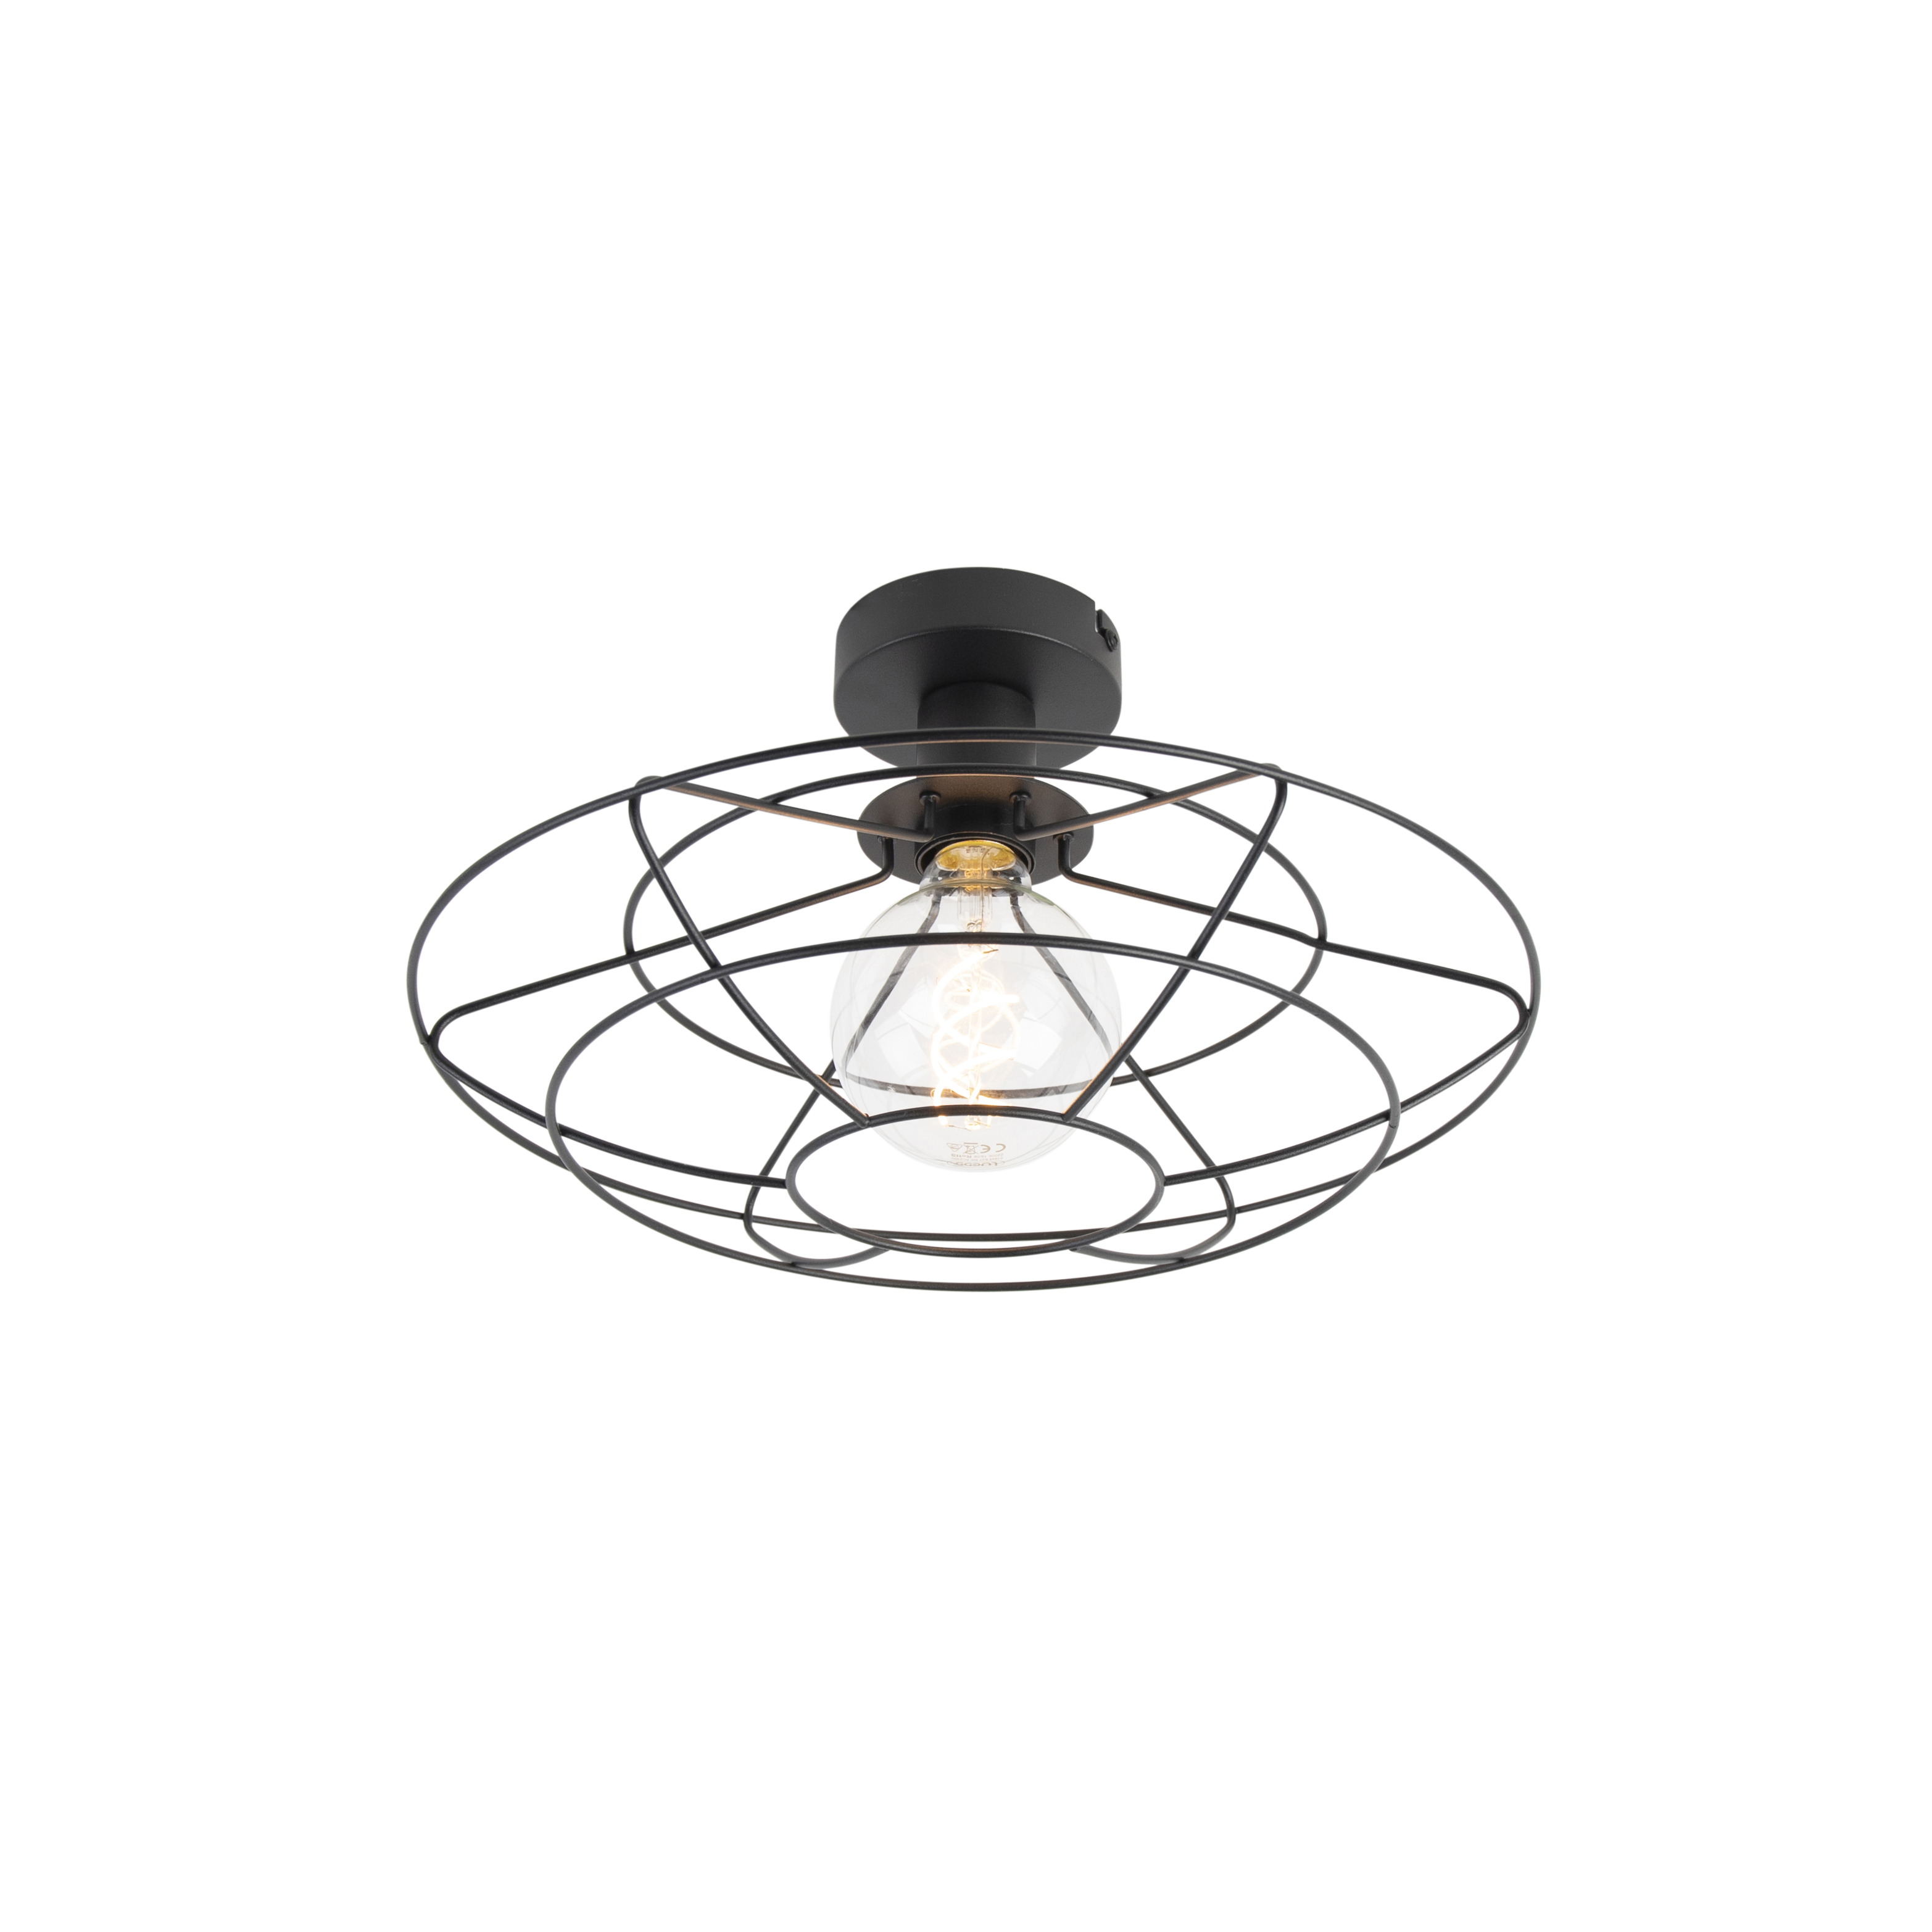 Vintage draadlamp 37cm plafond zwart - Laurent